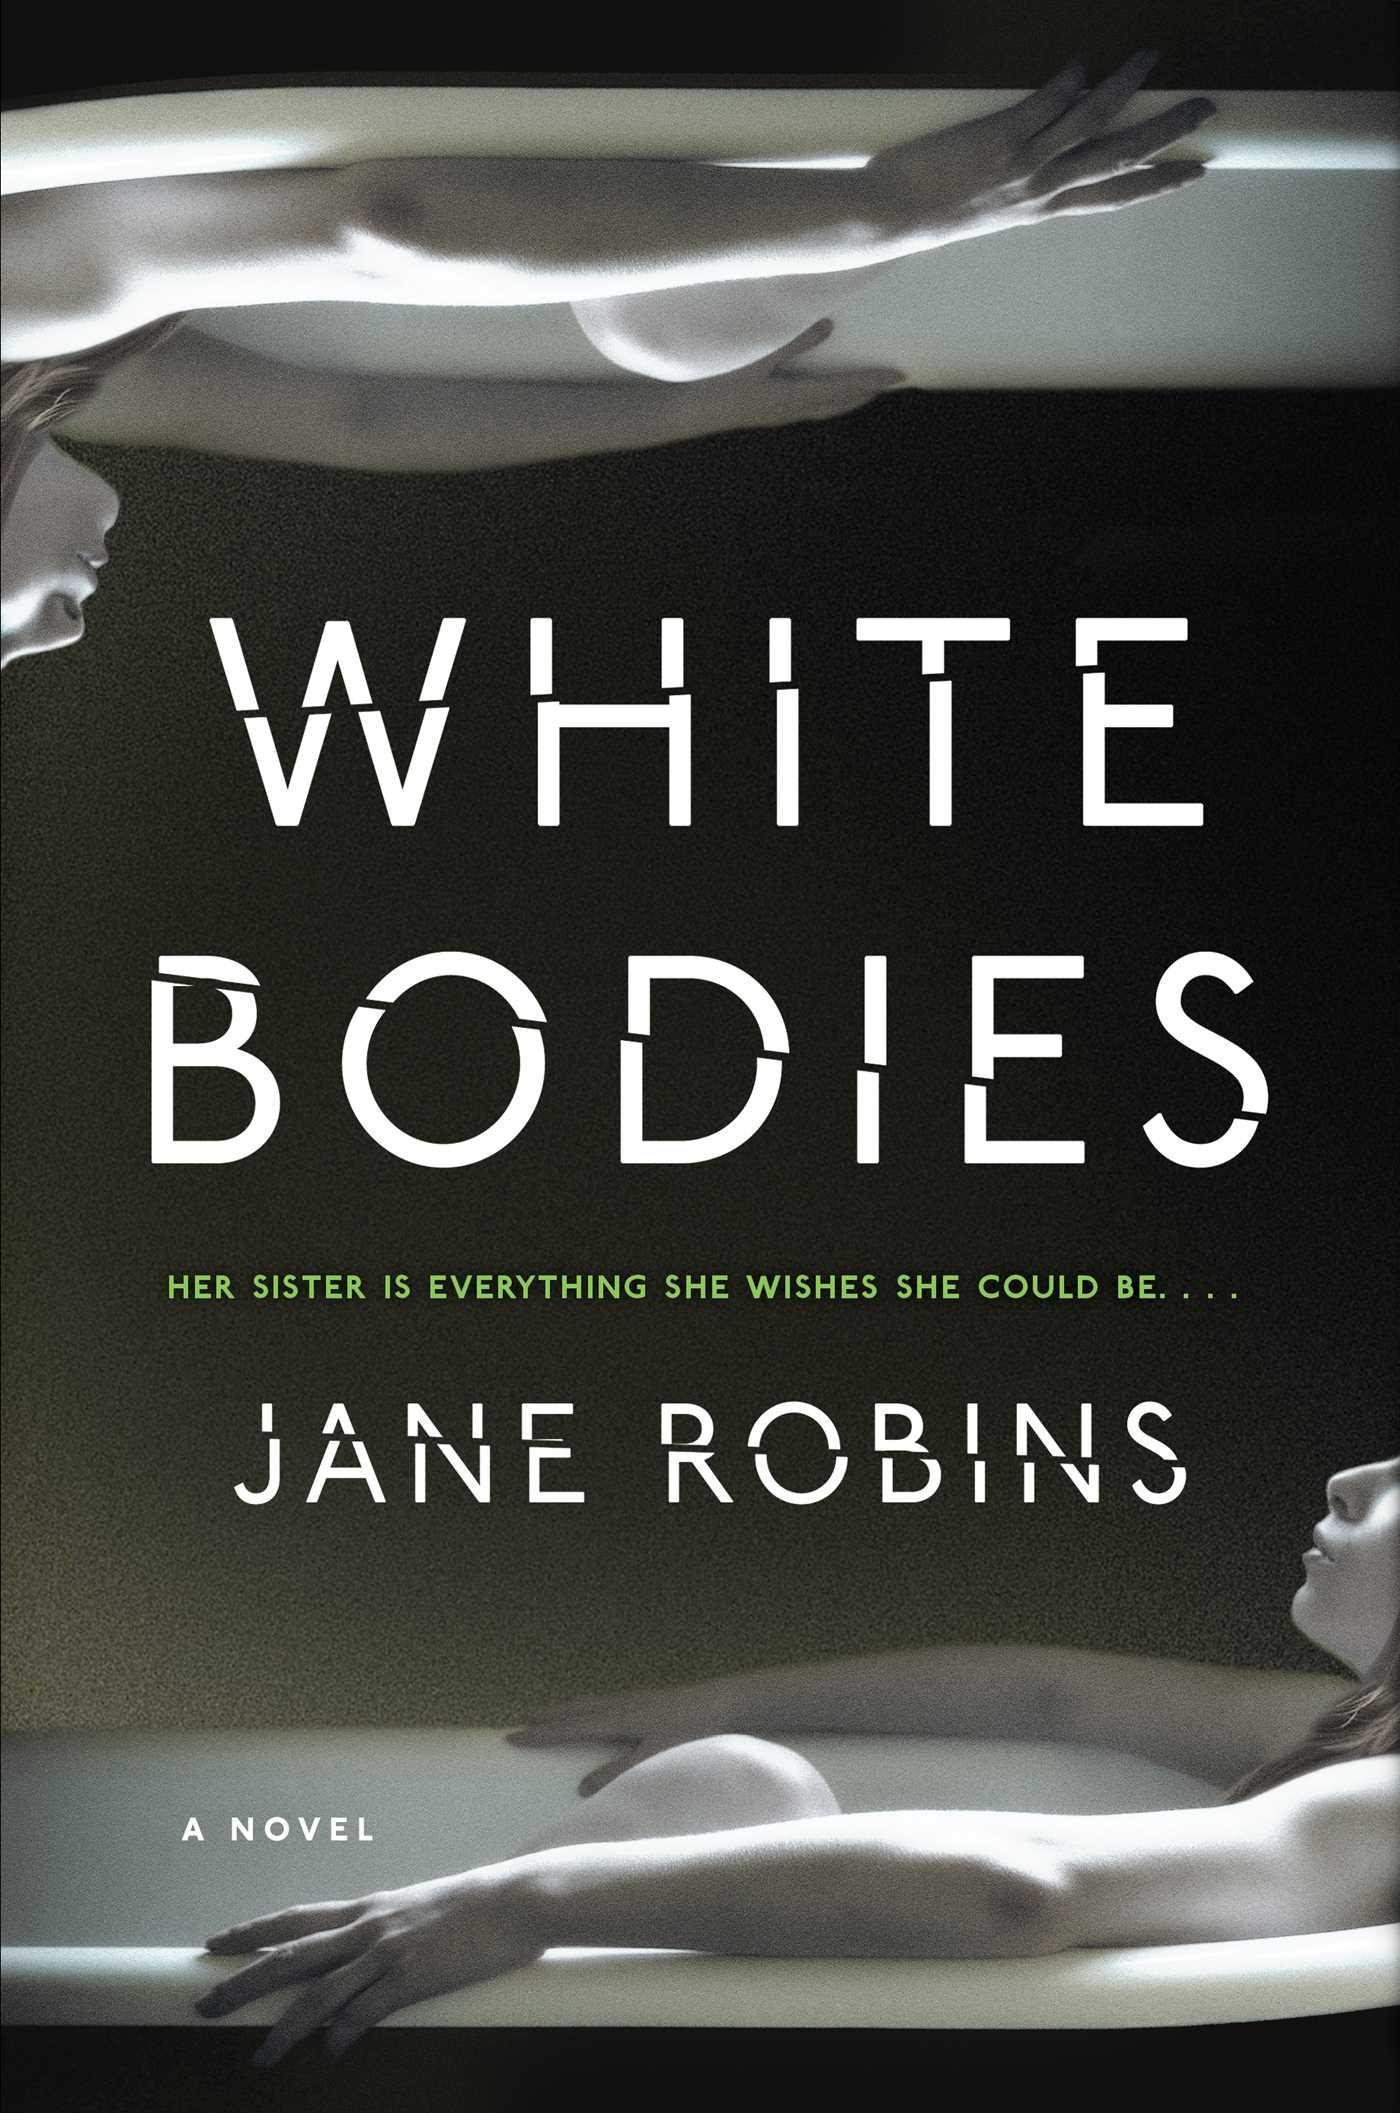 WhiteBodies.jpg